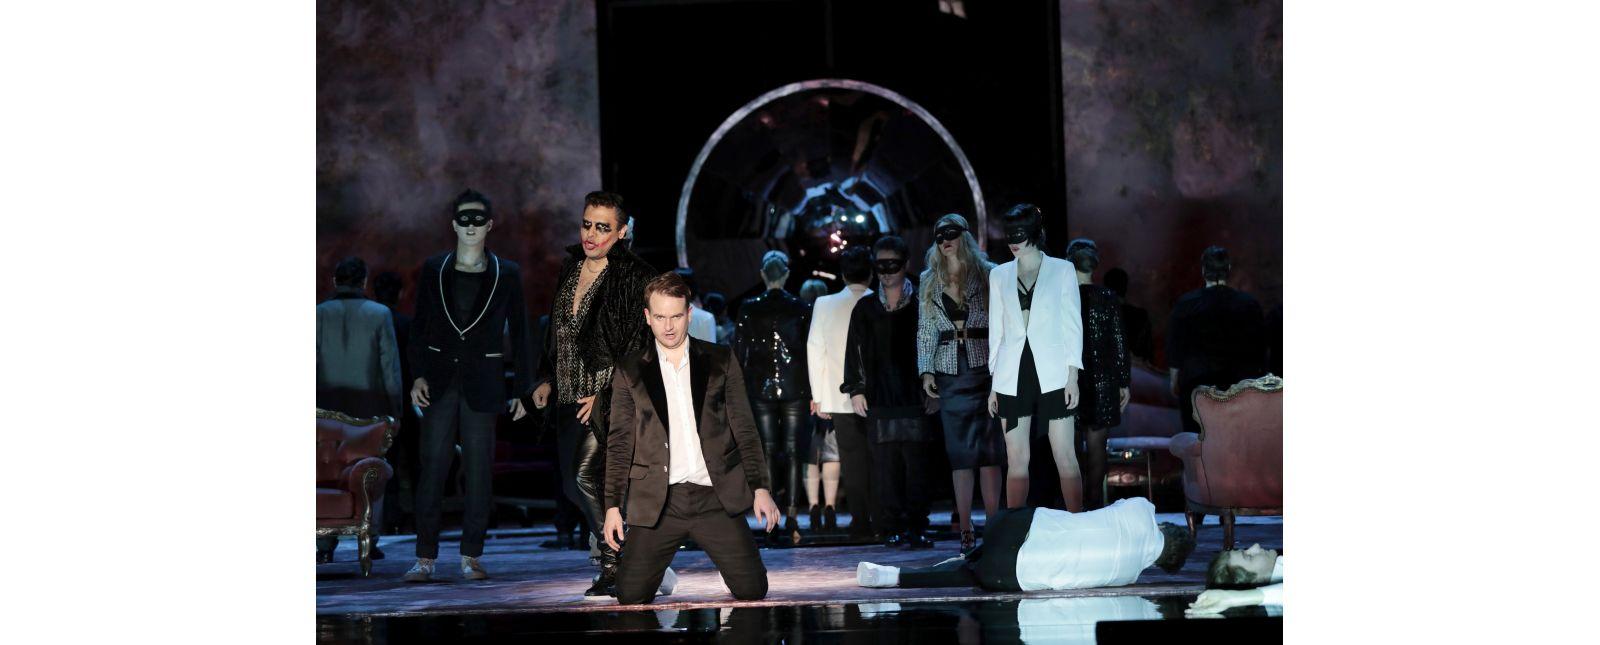 Don Giovanni // Opernchor // Jongsoo Yang // Juan Orozco // Michael Borth // Matteo Macchioni // Inga Schäfer // Samantha Gaul // Tänzer_innen //  2019 // Foto: Paul Leclaire